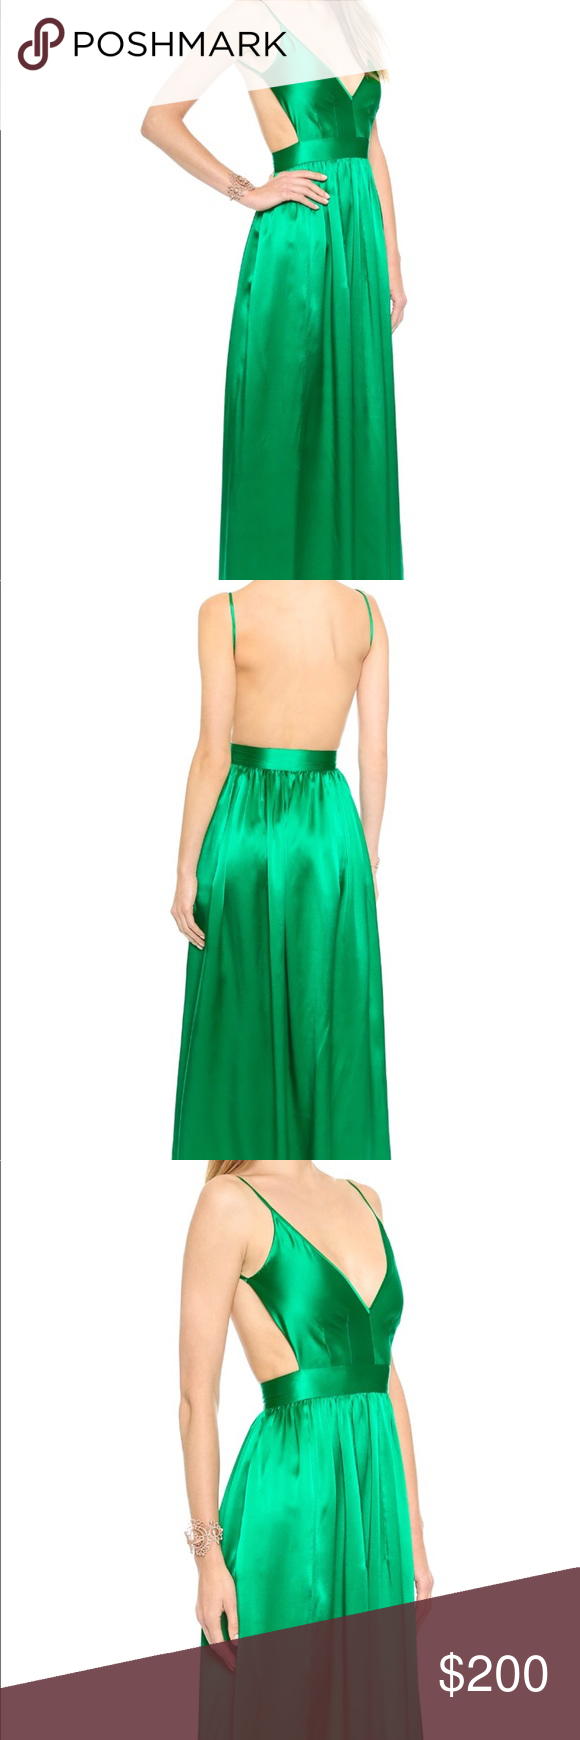 Shopbop green backless gown worn once shop bop backless green silk